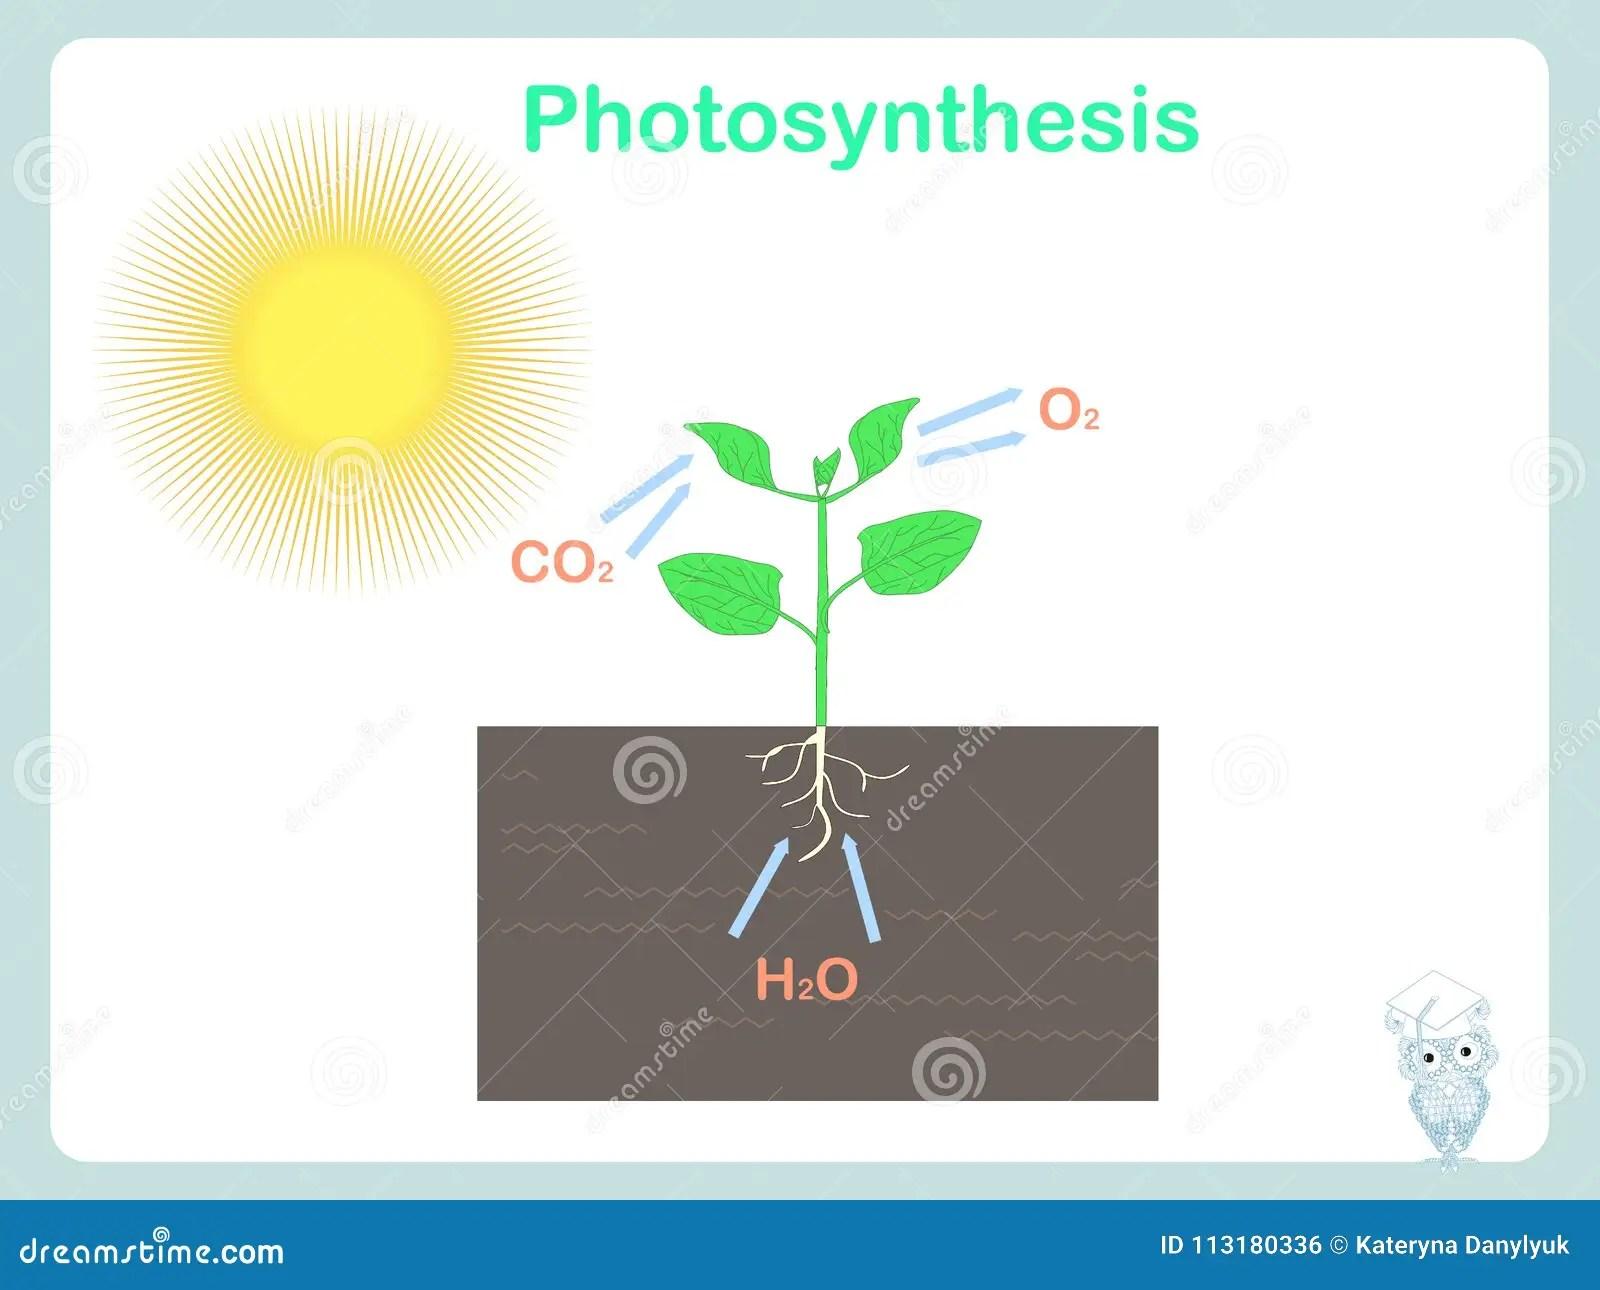 photosynthesis z scheme diagram solar power schematic images stock photos vectors